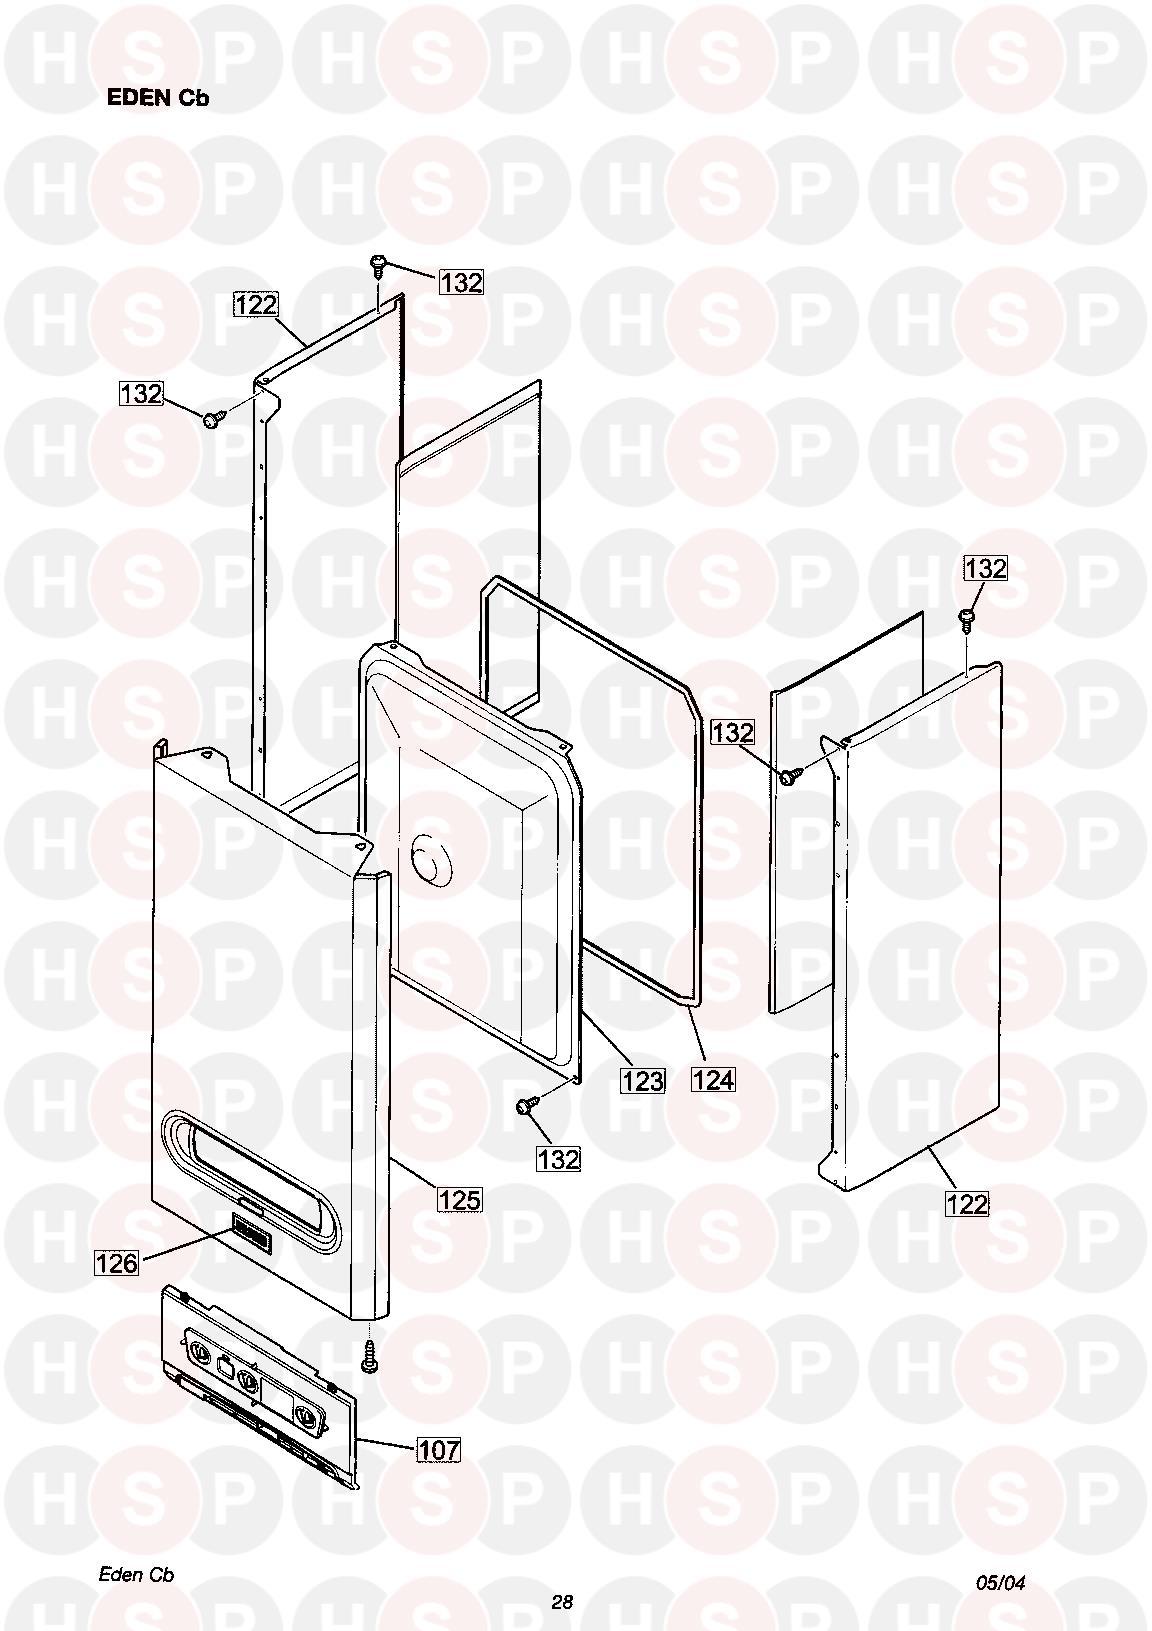 halstead eden sb  casing and control panel  diagram